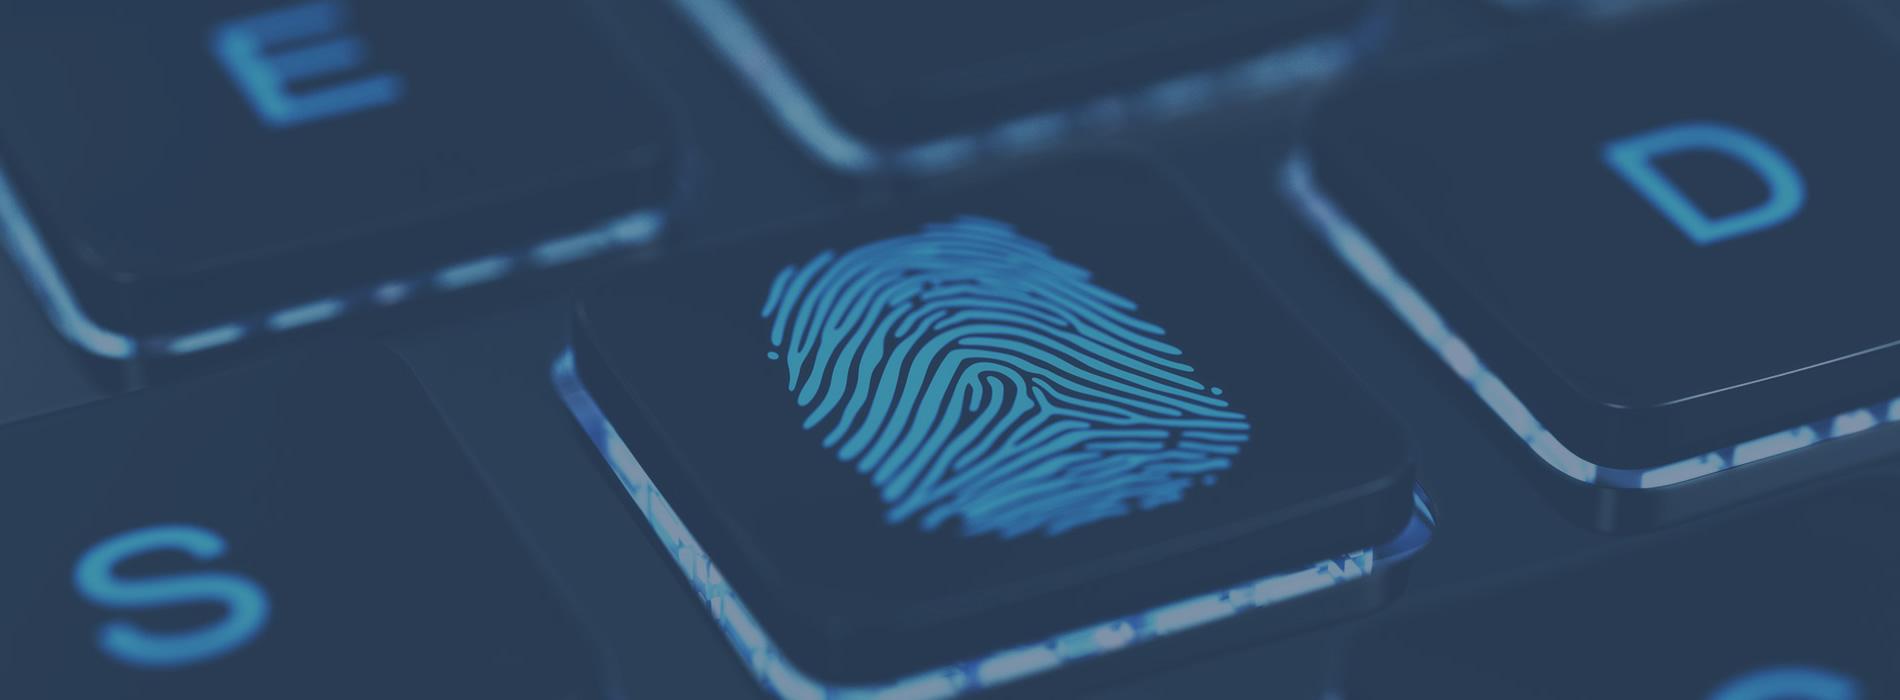 Perizie forensi, indagini digitali